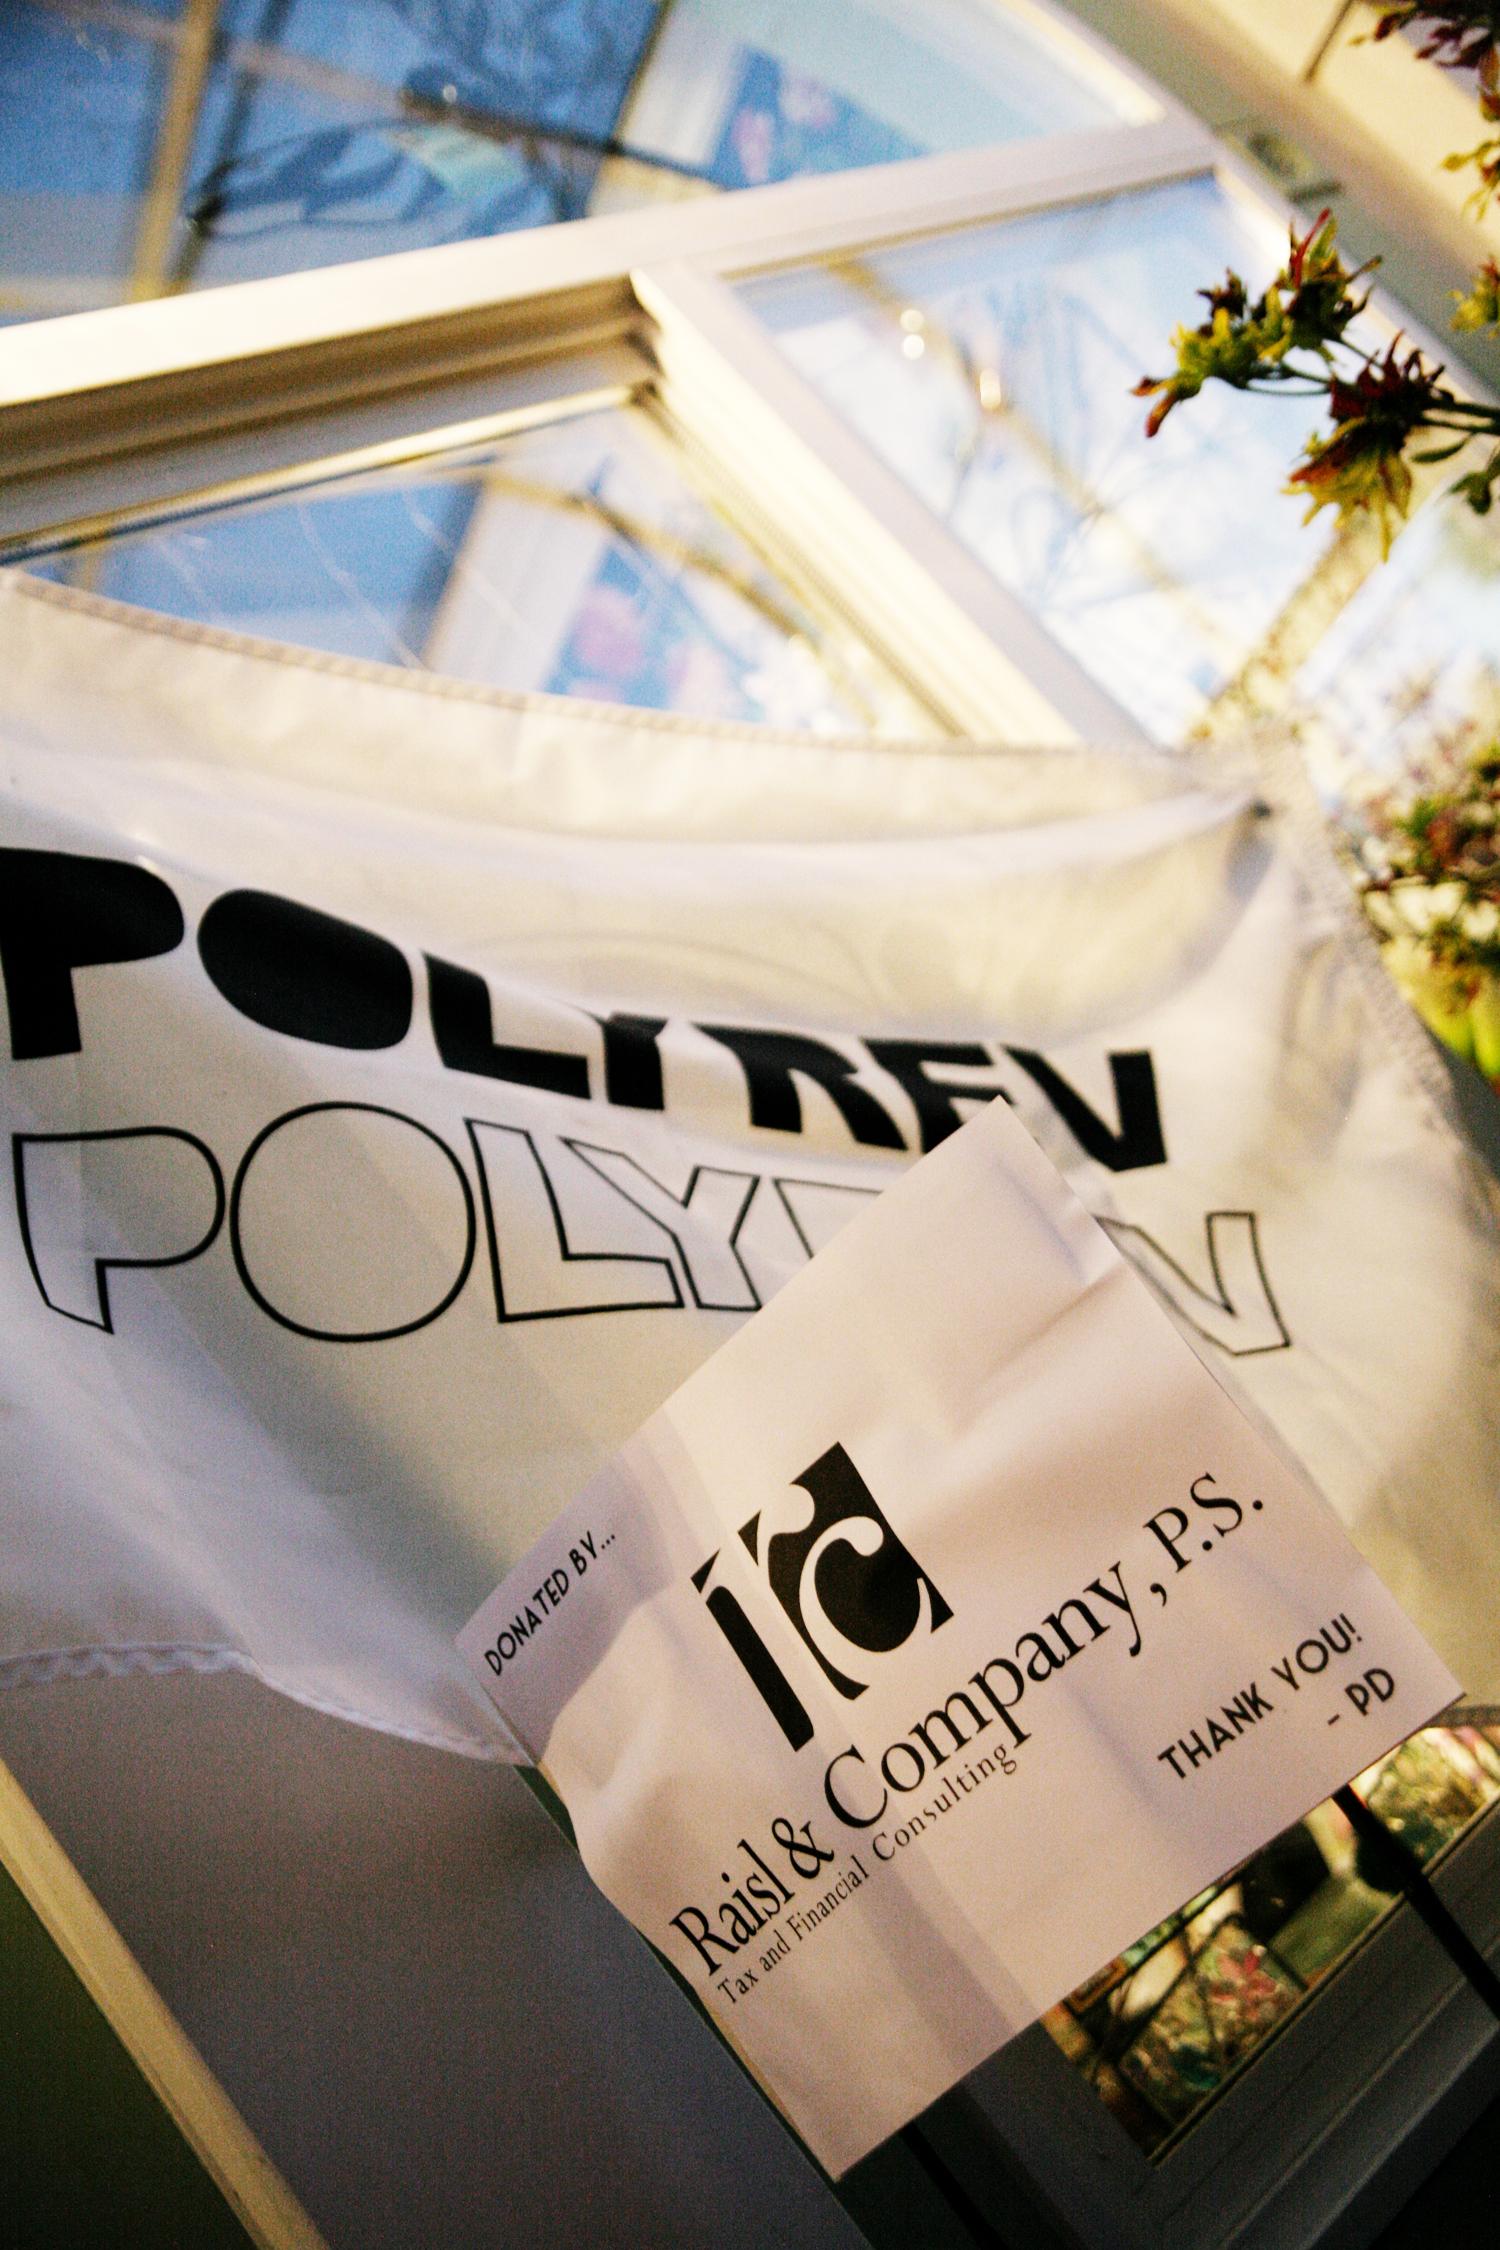 Polyrev and Raisl & Company PS